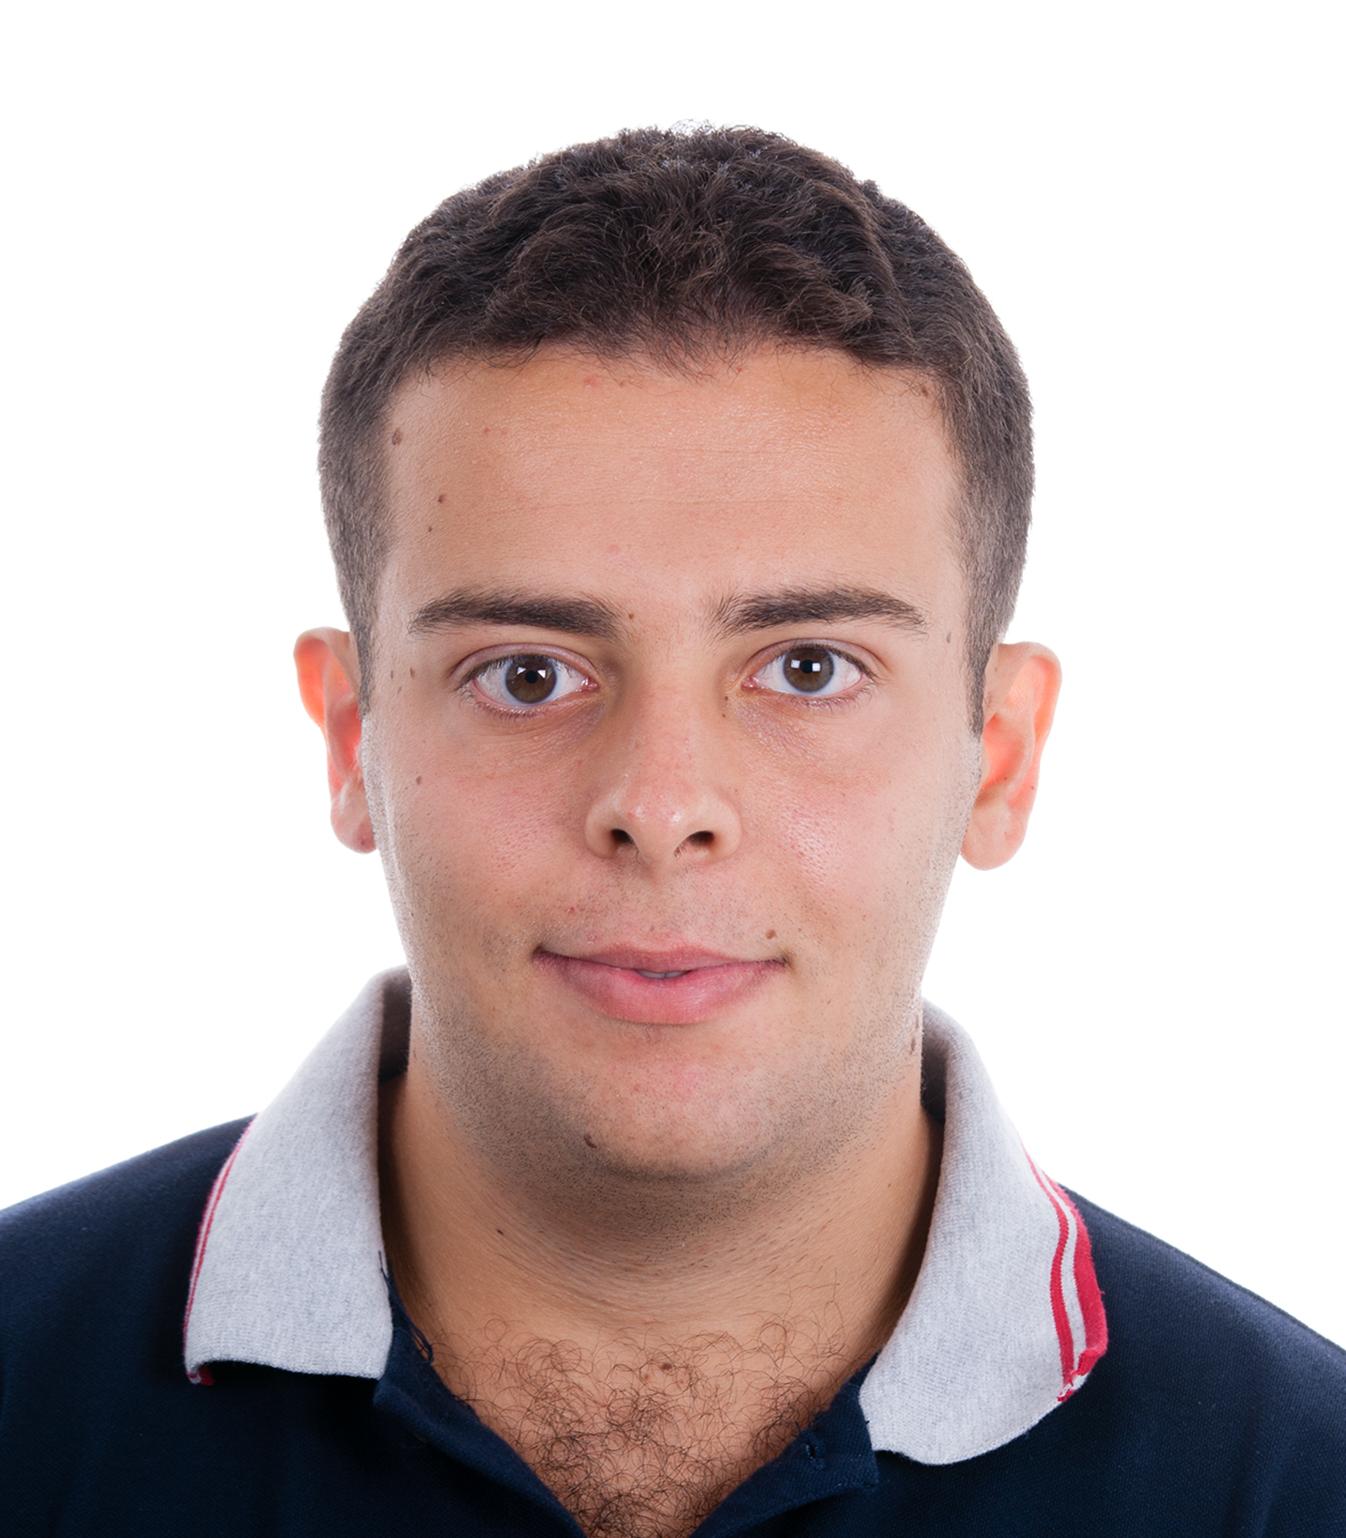 Andrea Turco